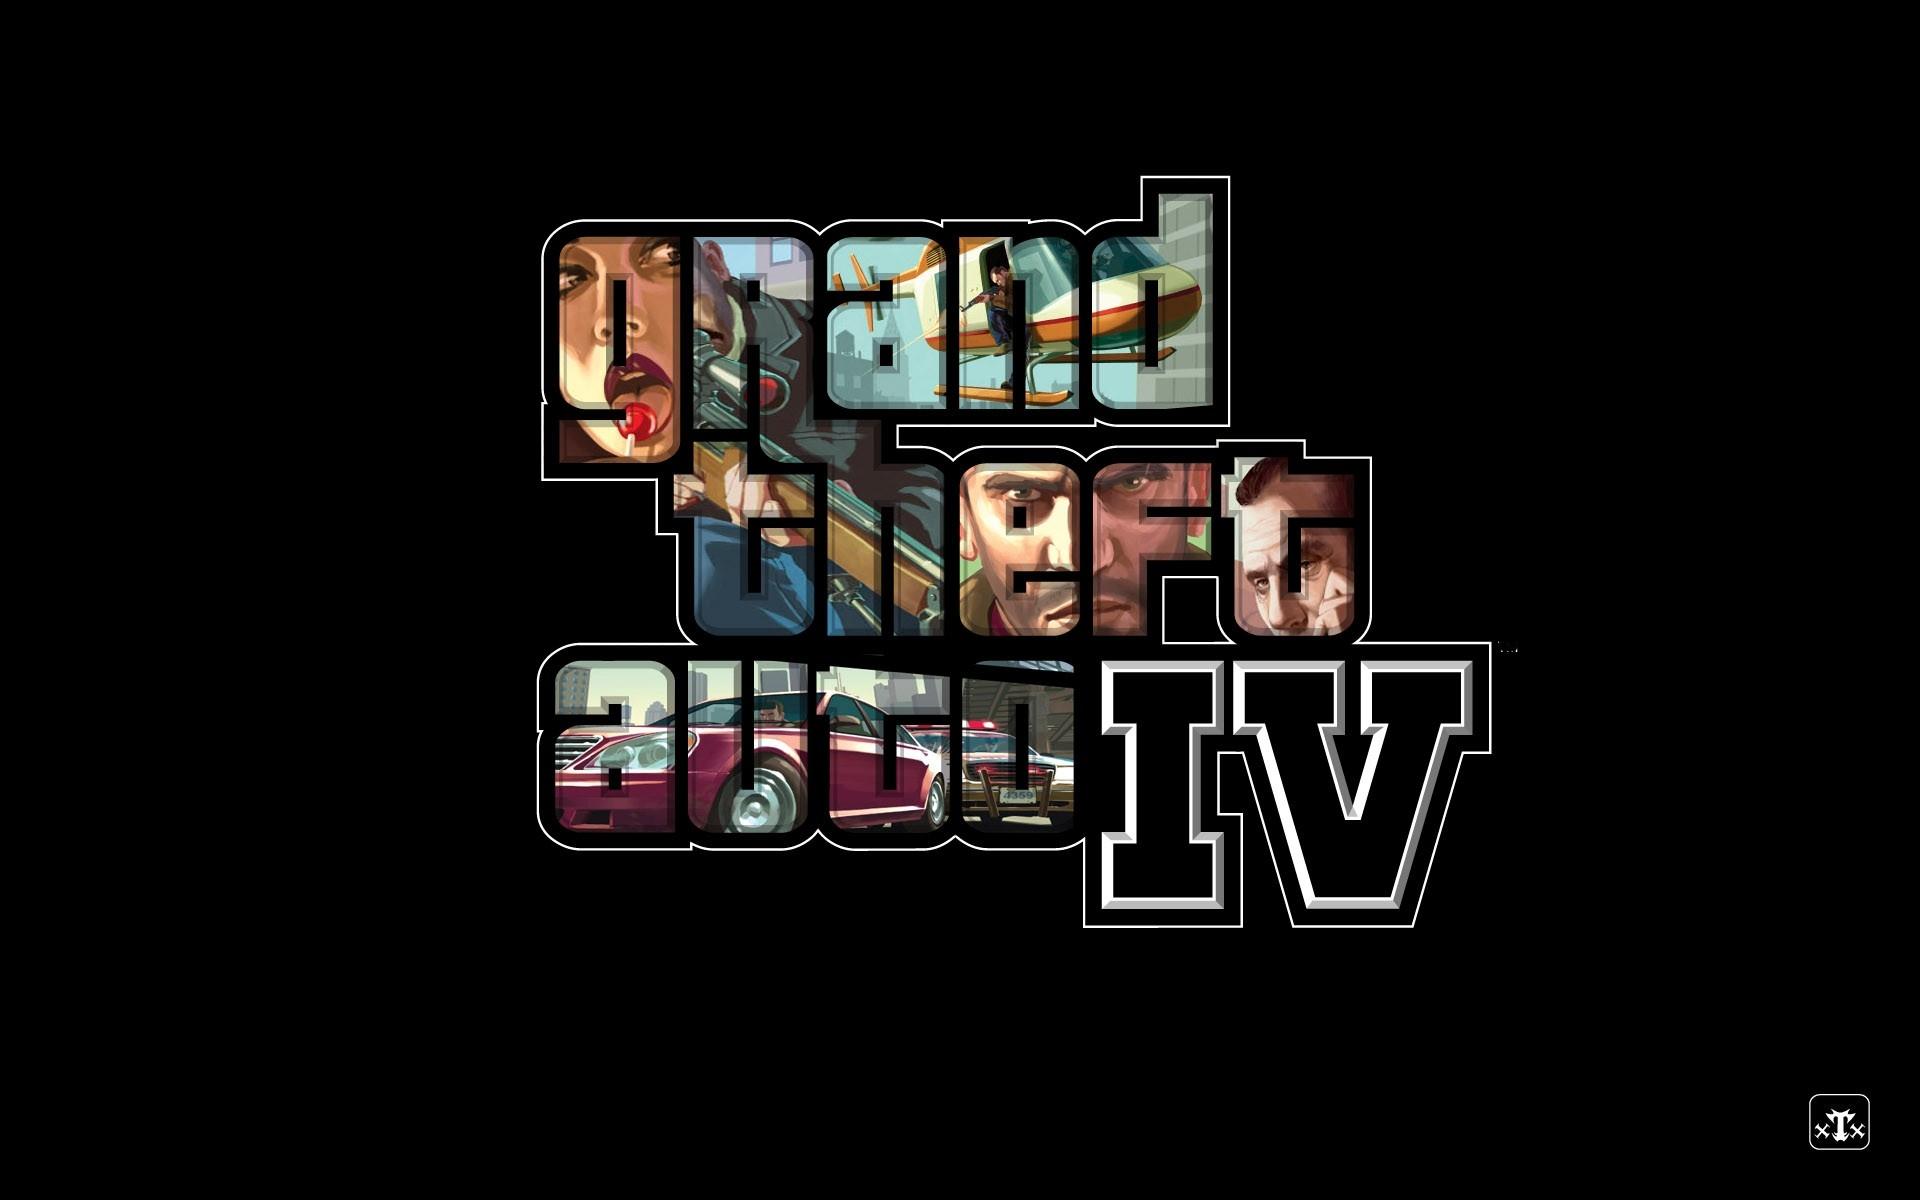 Wallpaper Gta Grand Theft Auto 4 Game Name Shots 1920x1200